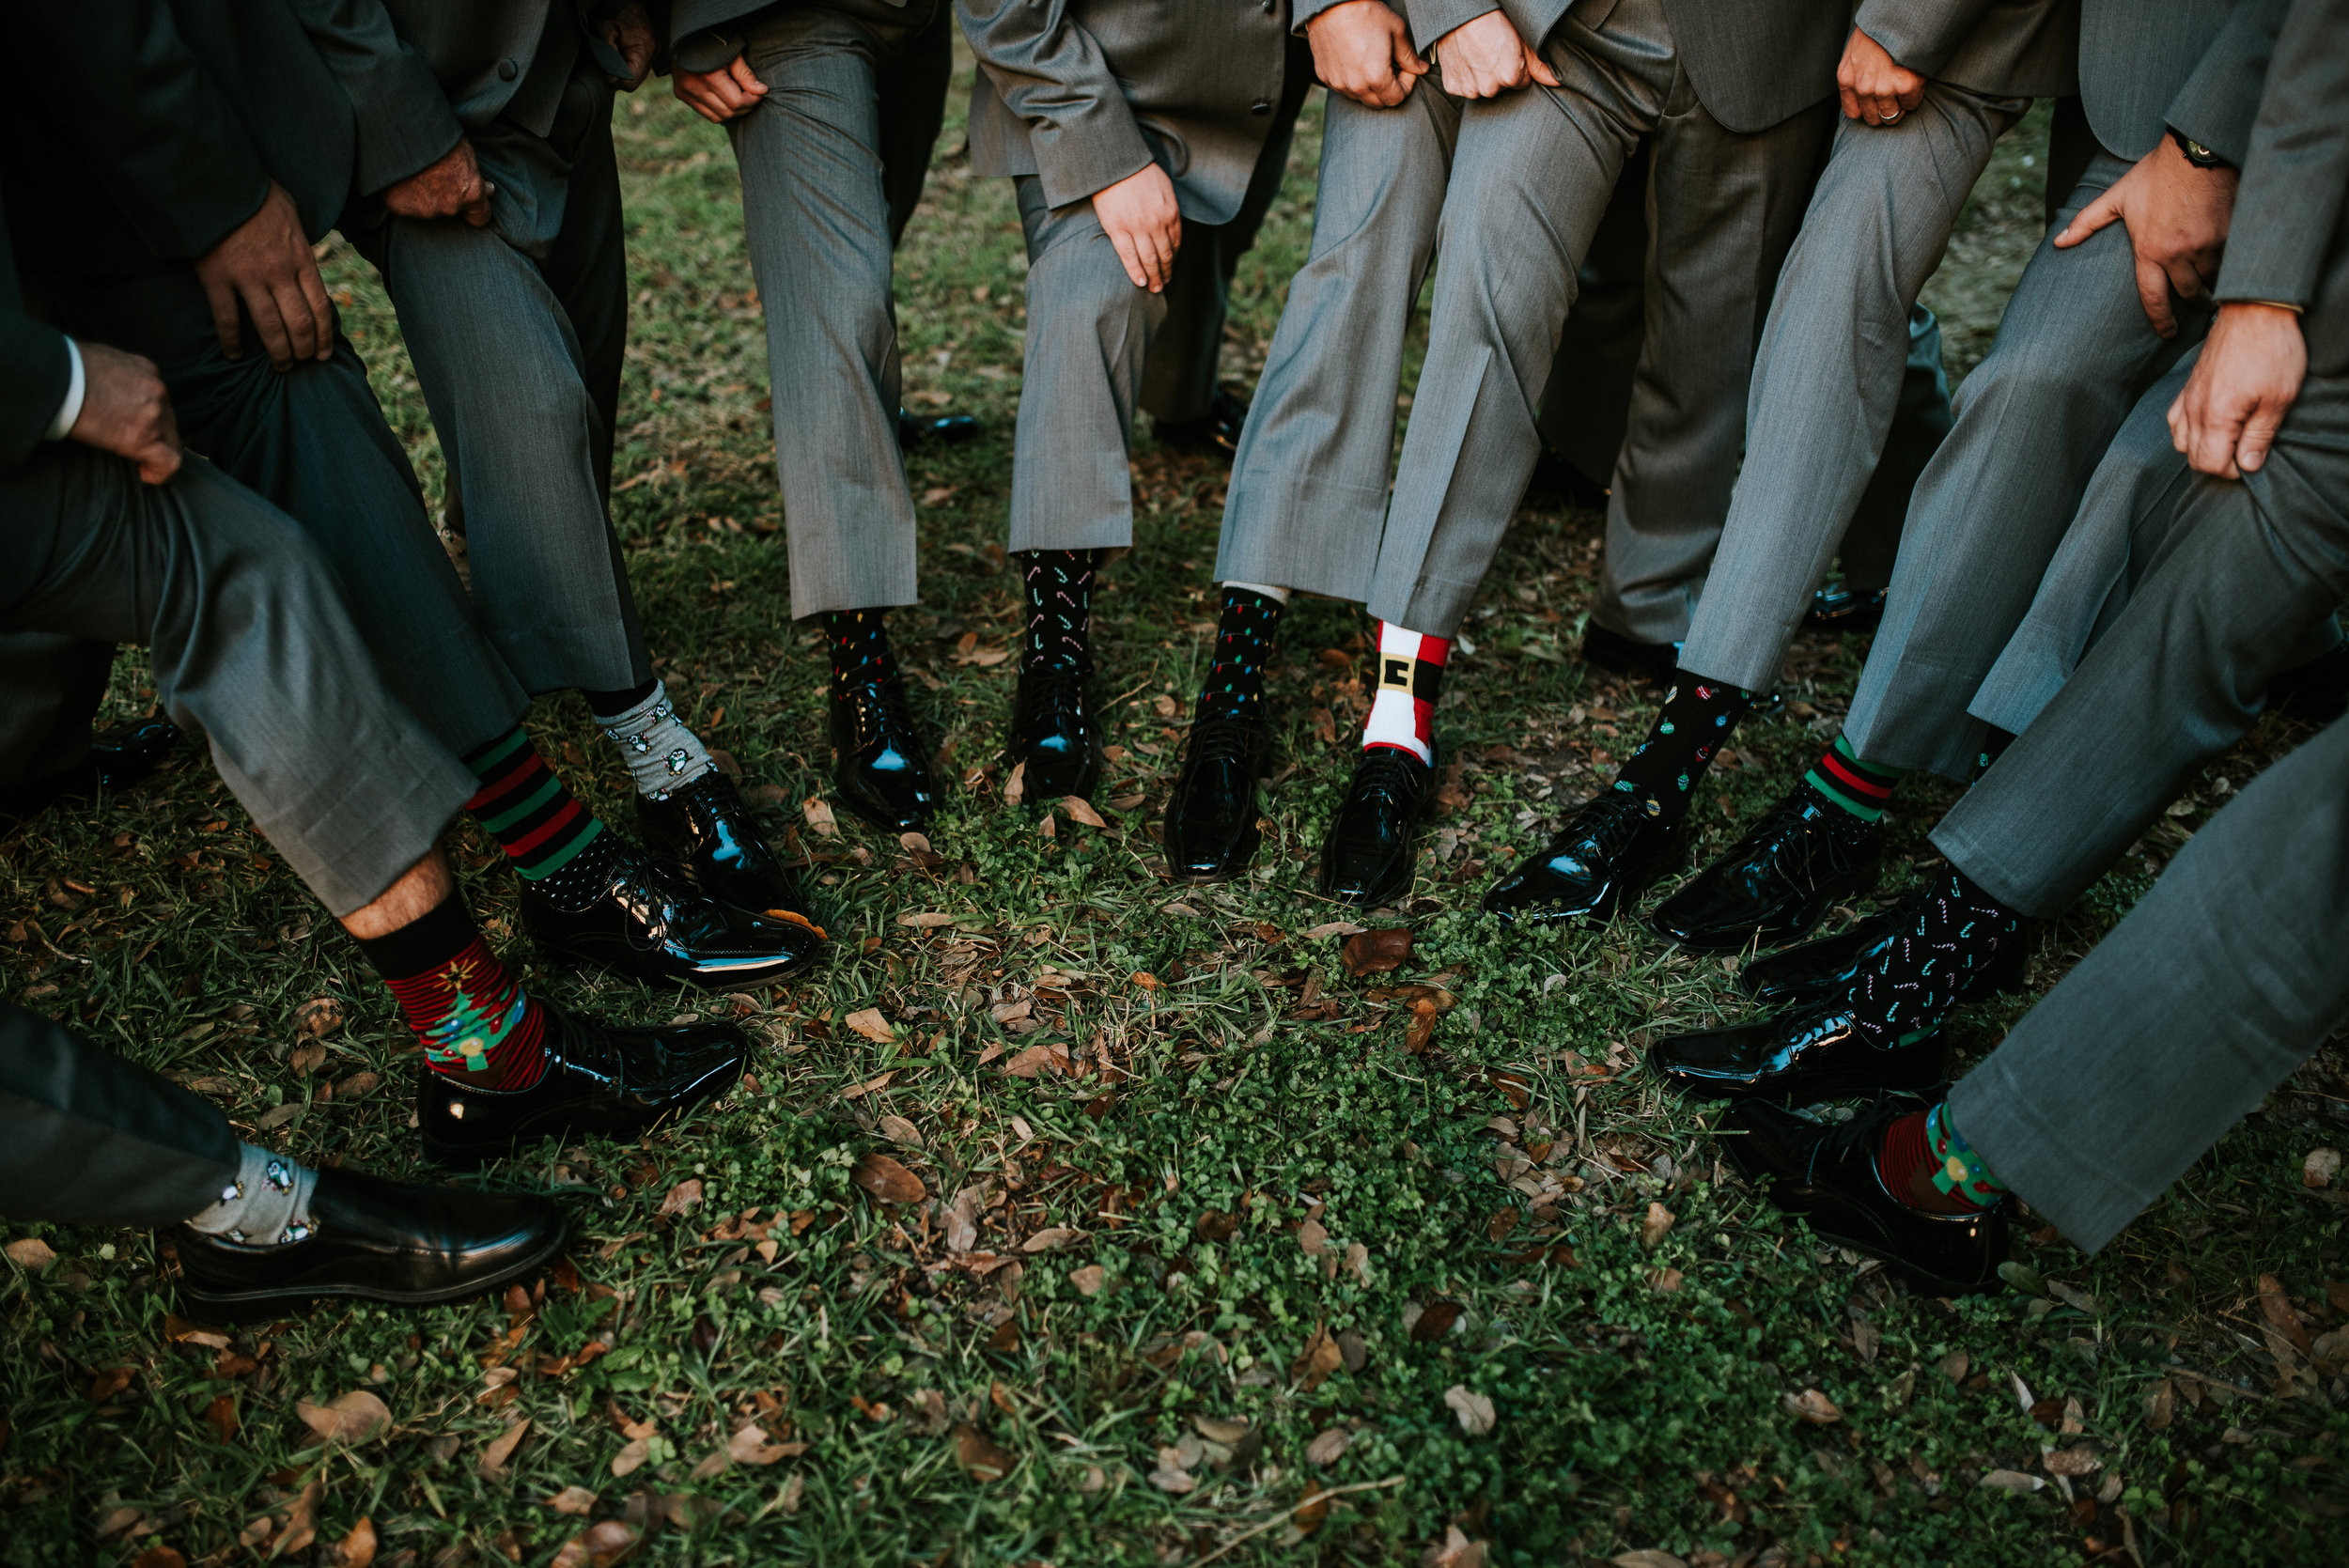 Southern Fete, Southern Wedding, Groomsman, Wedding Christmas dress socks, Hannah Mulligan Photography